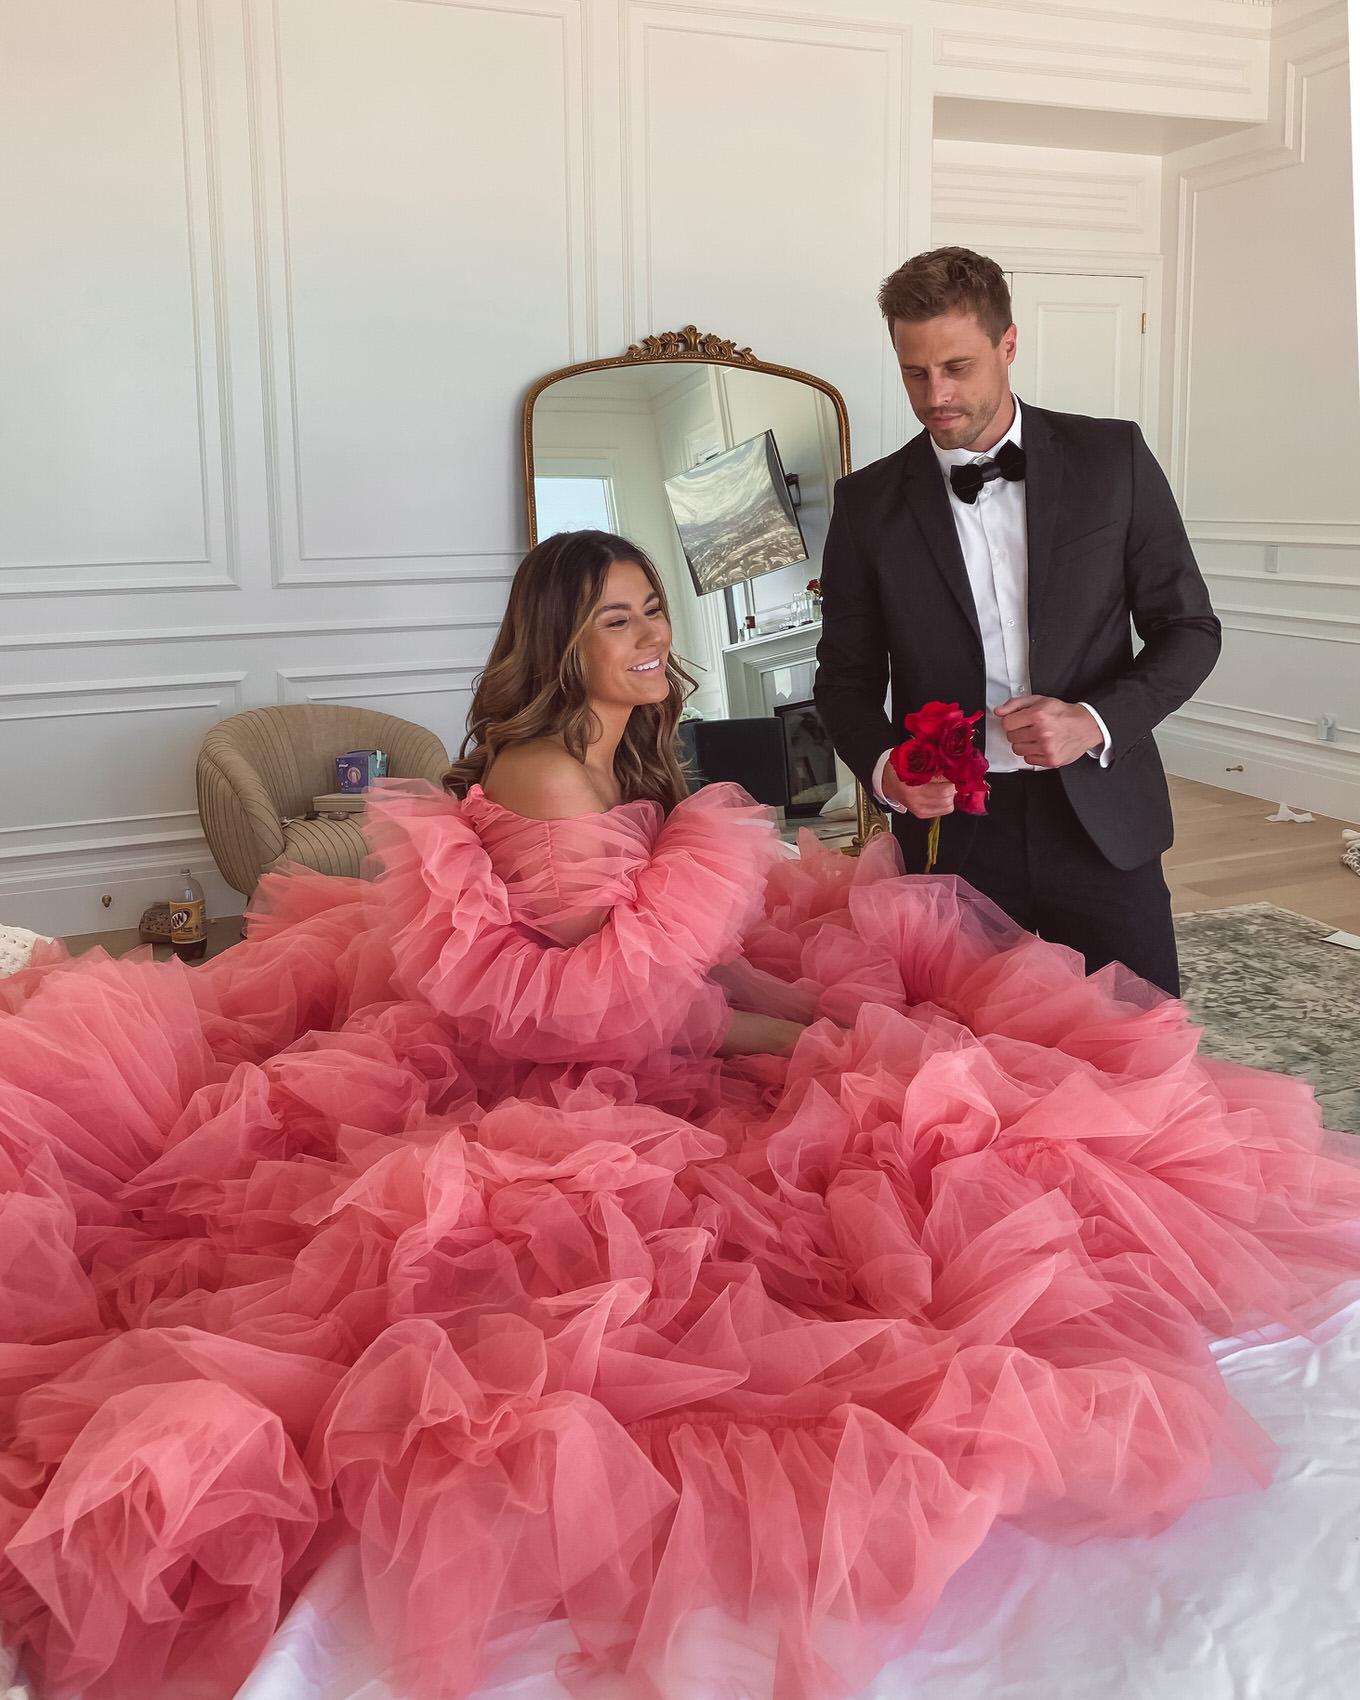 amazing valentine's dress